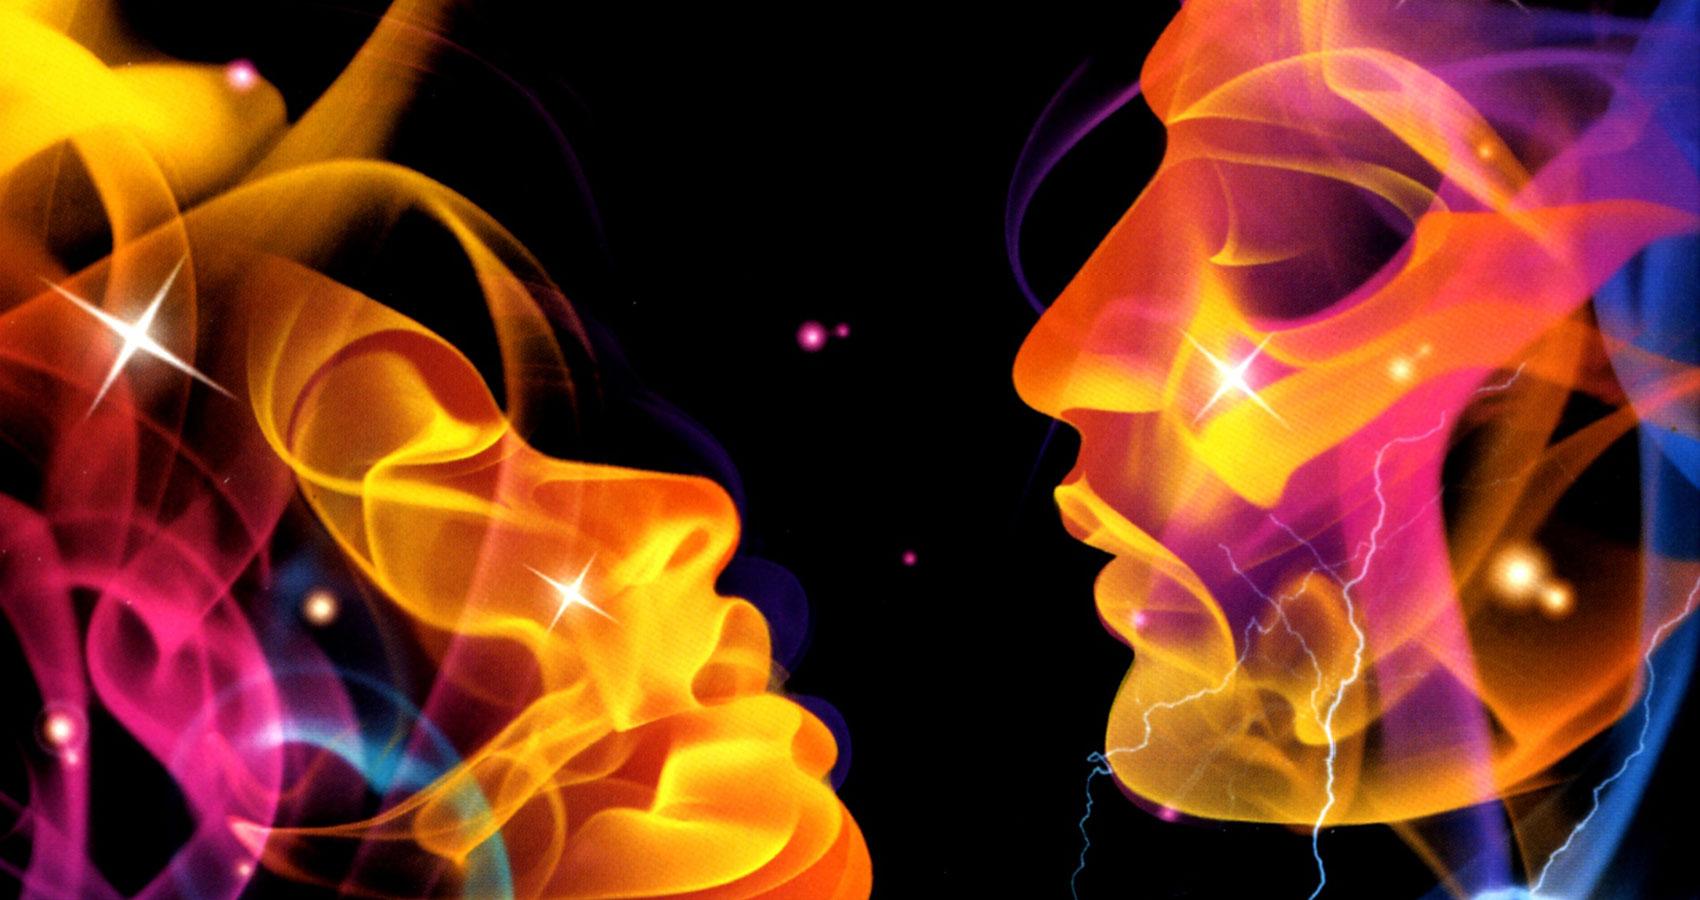 Sun & Moon! written by Shruthi Shankel at Spillwords.com